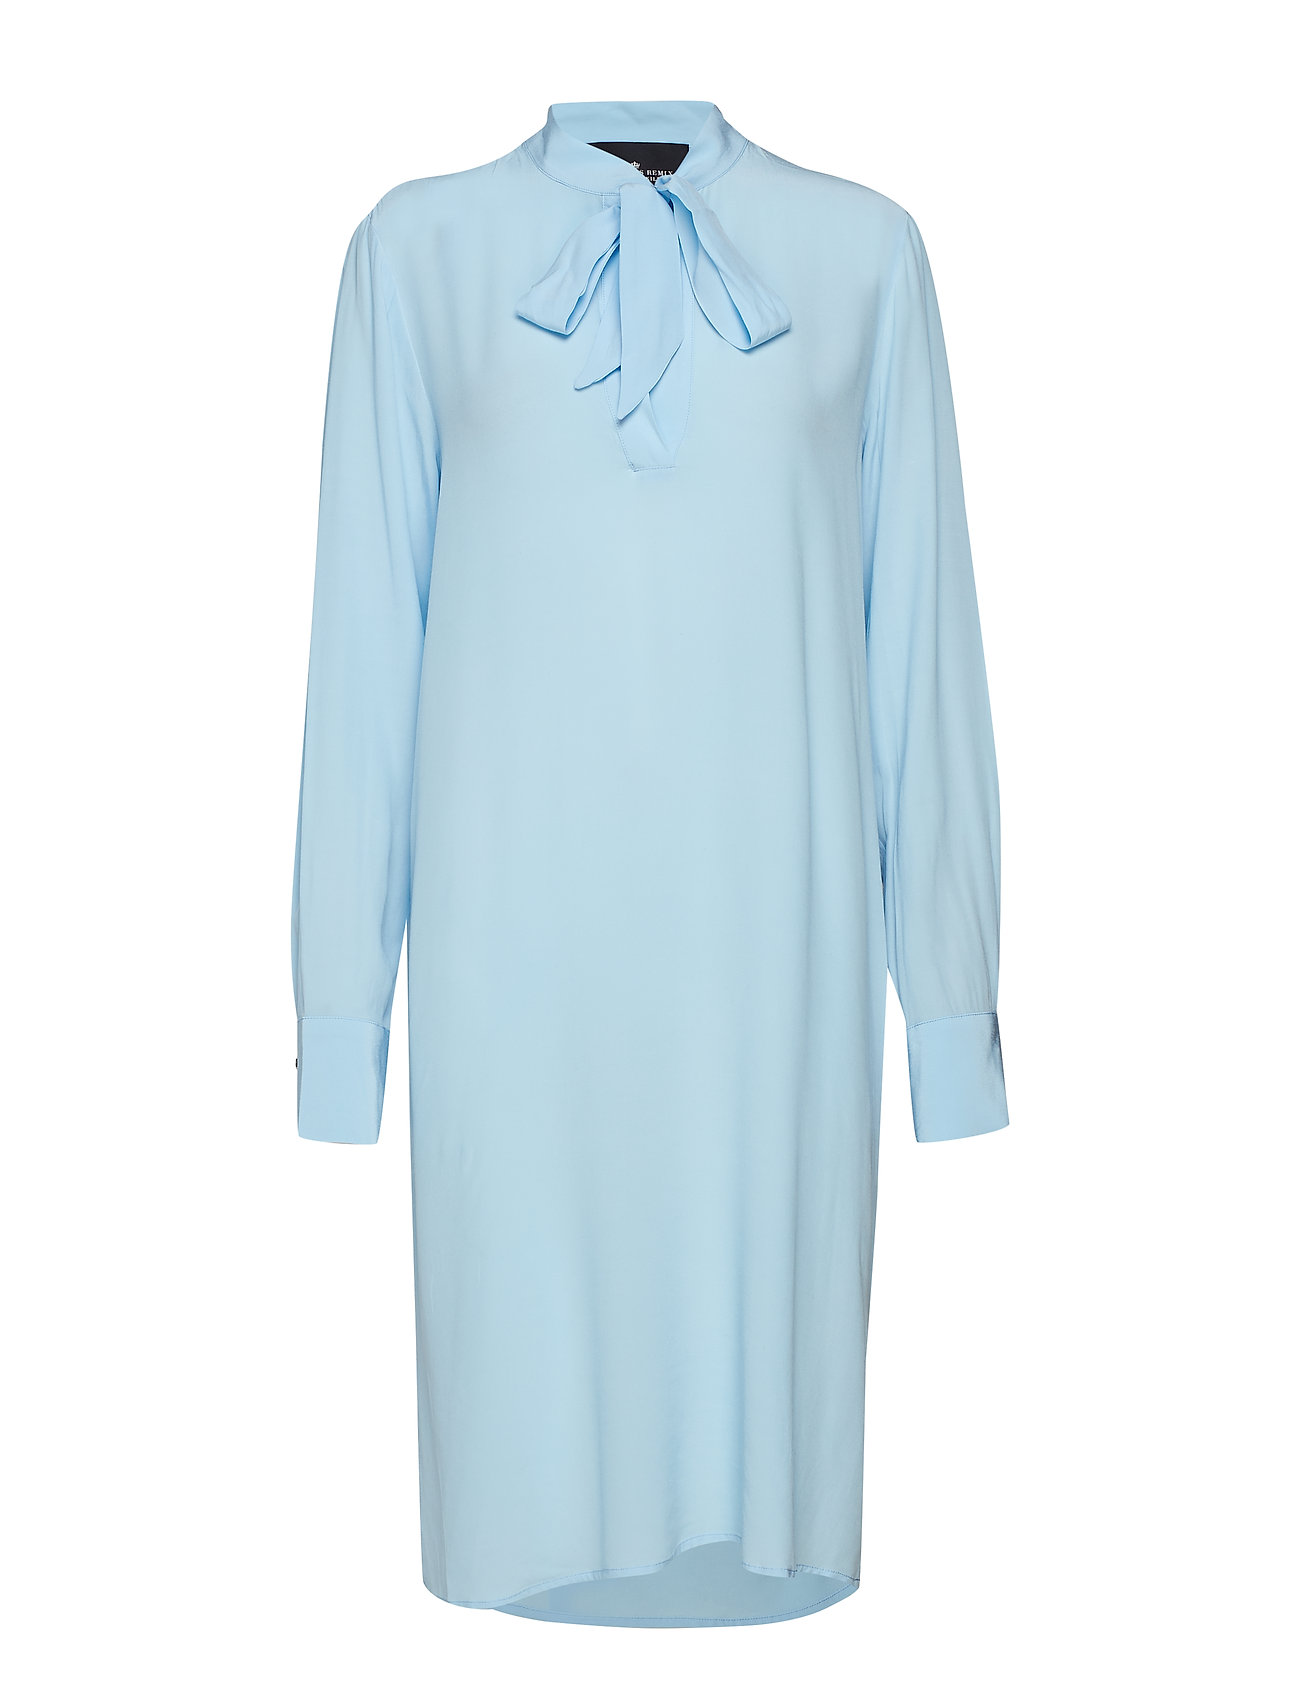 DESIGNERS, REMIX Nini Tie Dress - SKY BLUE